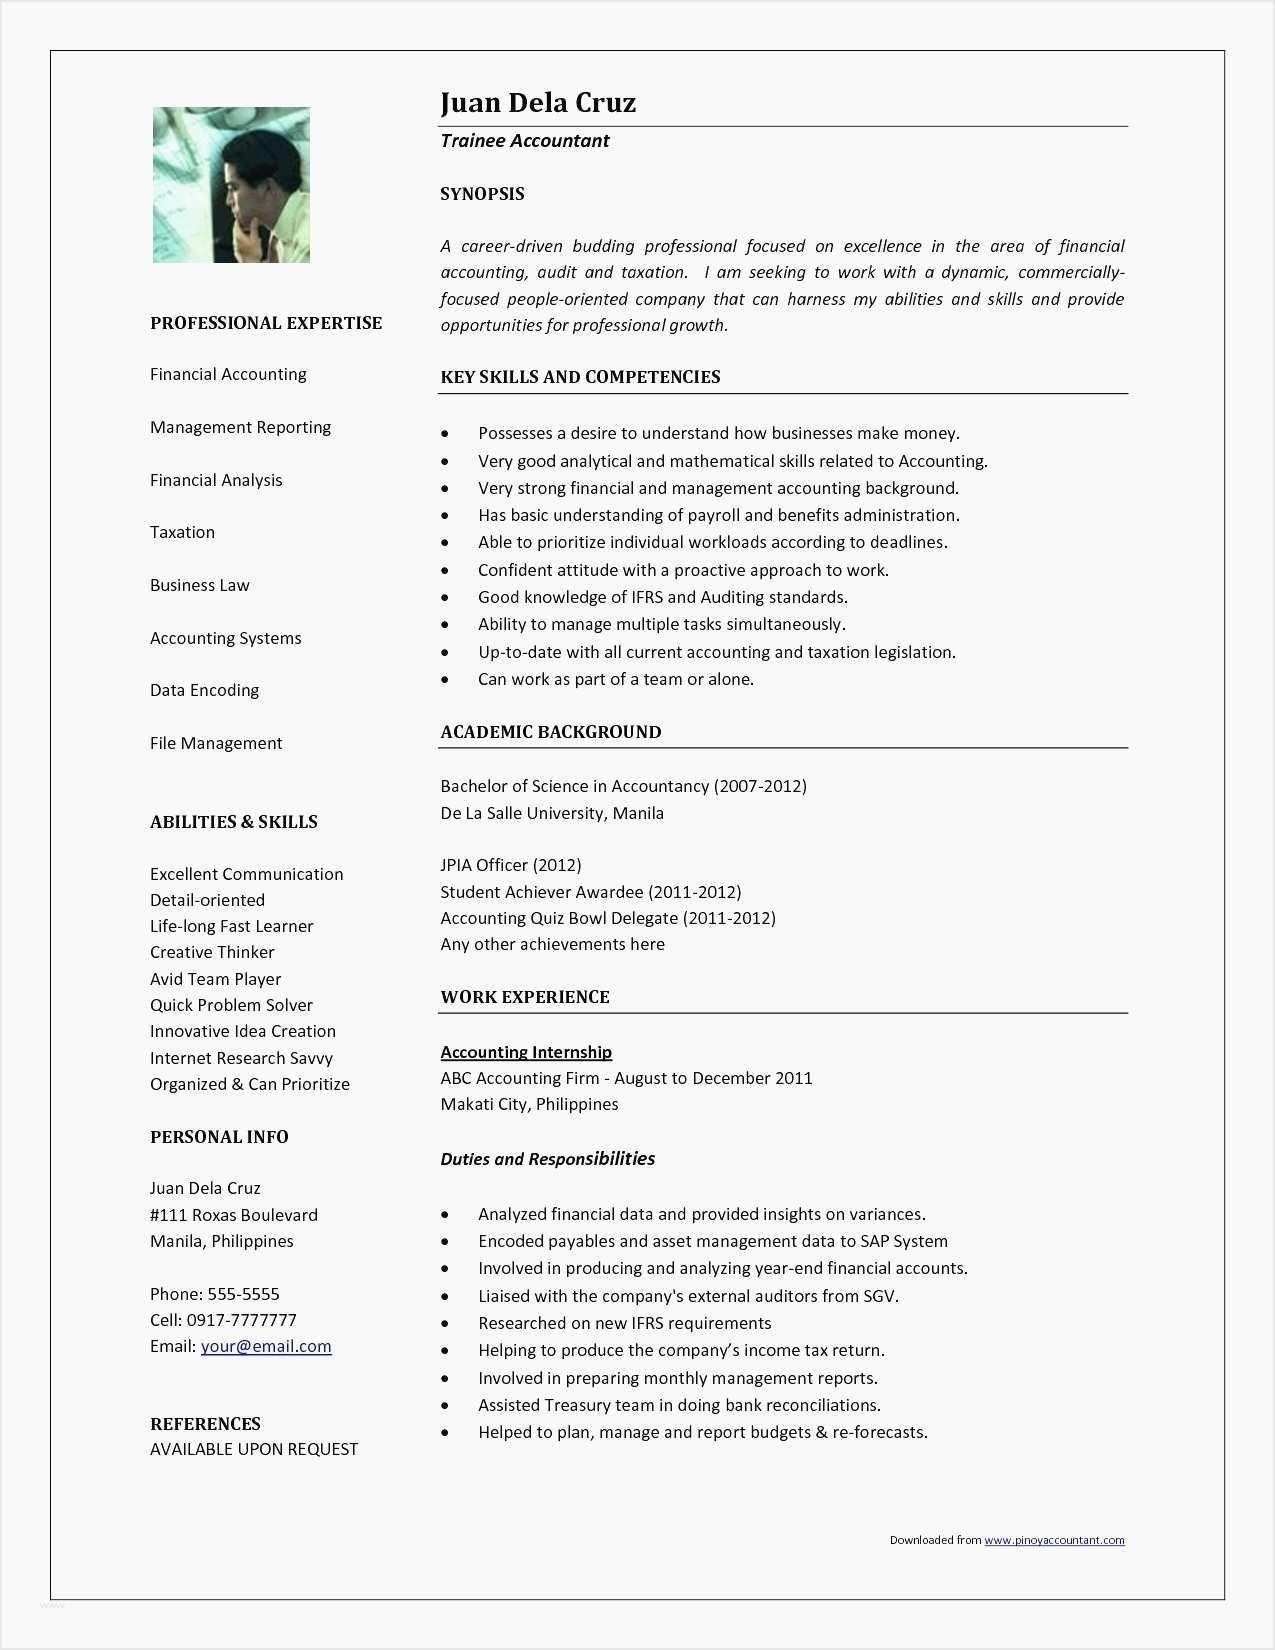 Free Advice on your Resume' Cv resume template, Cv